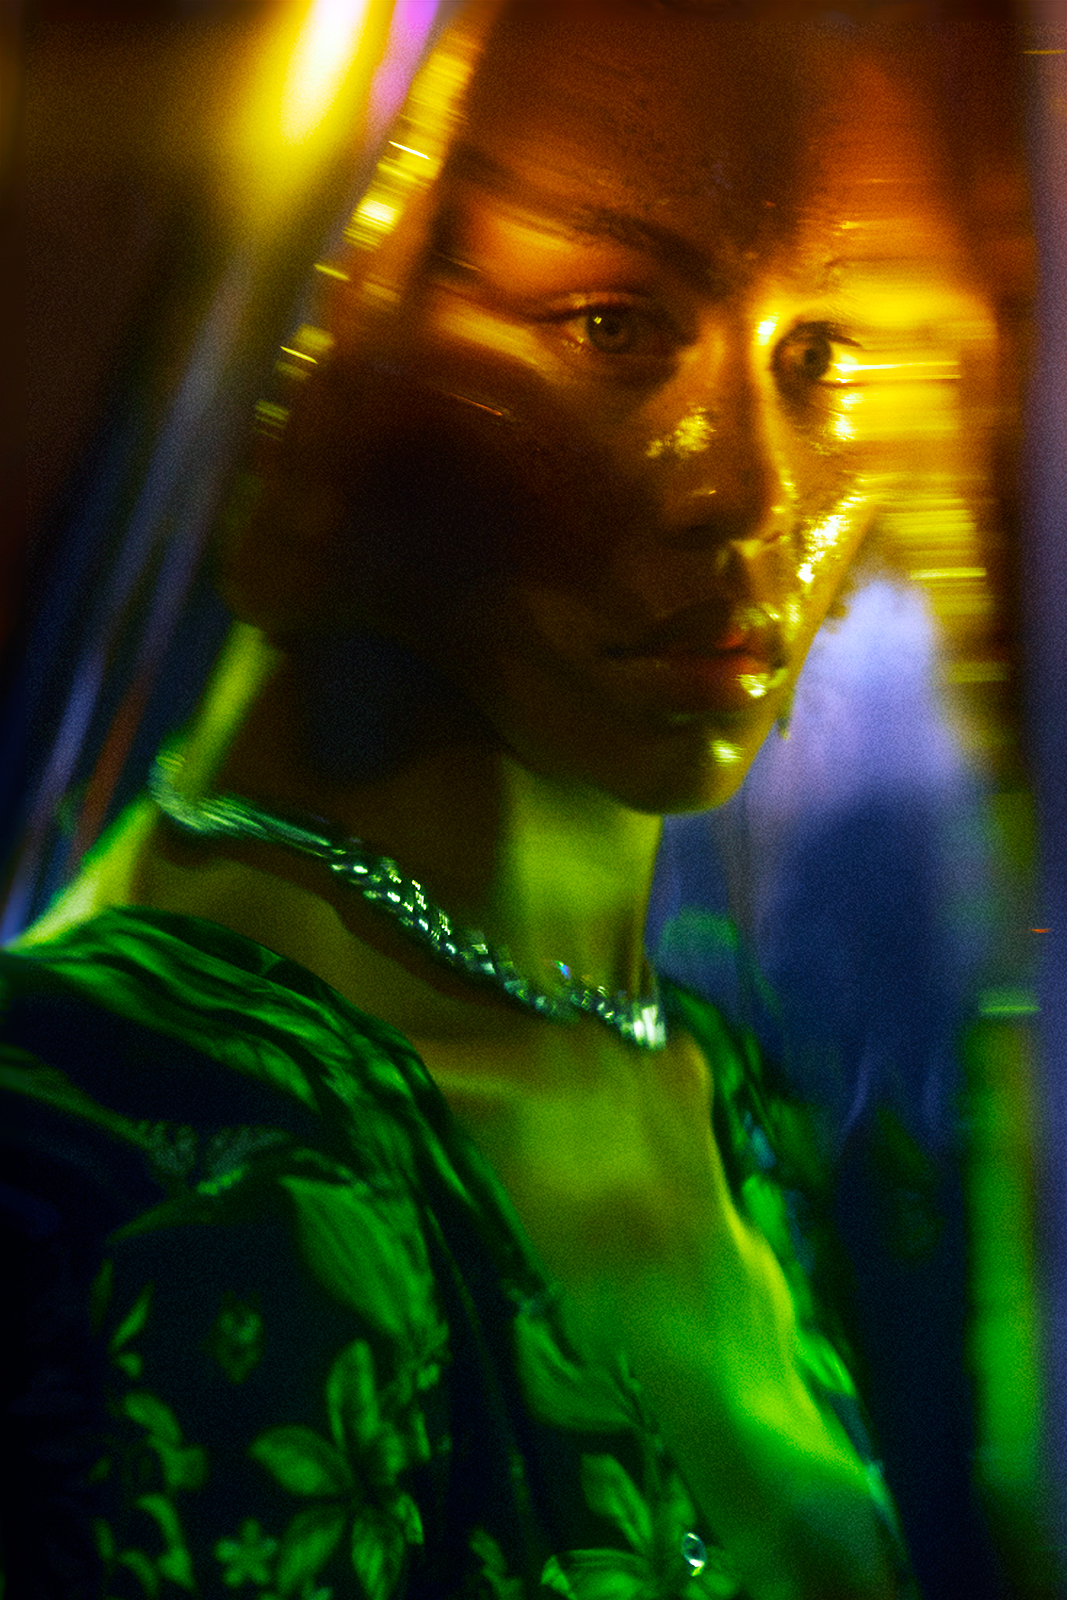 Model: Adima Z @ Munich Models Makeup & Hair: Renata Traupe Styling: Lorand Lajos Production: Winteler Production